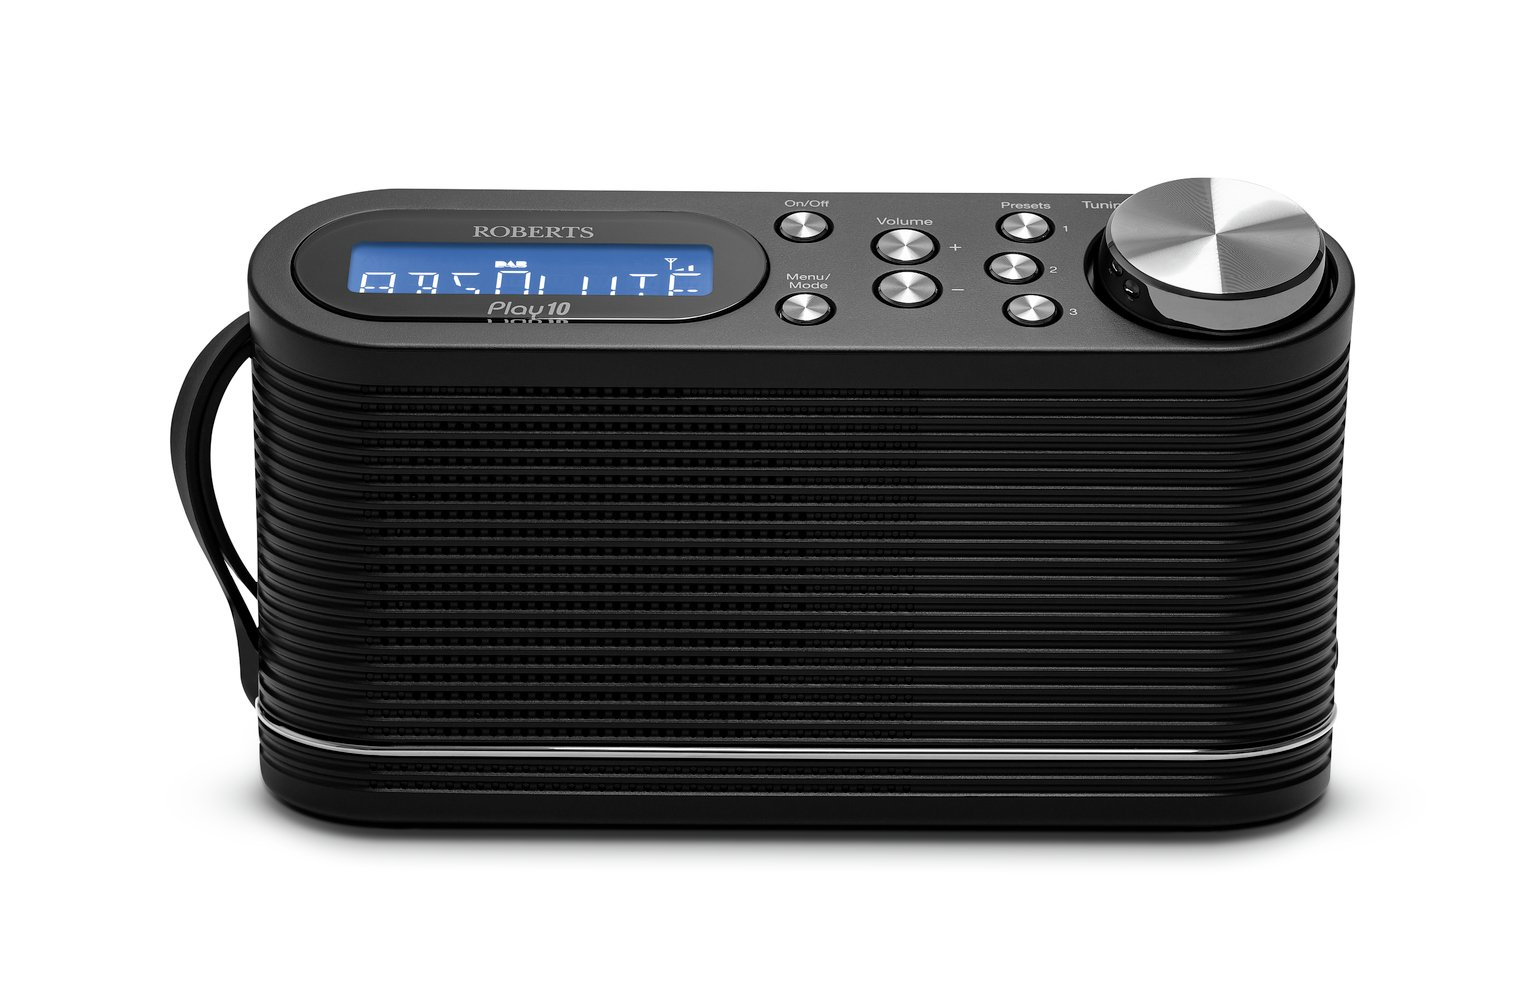 Roberts - Play 10 DAB Radio